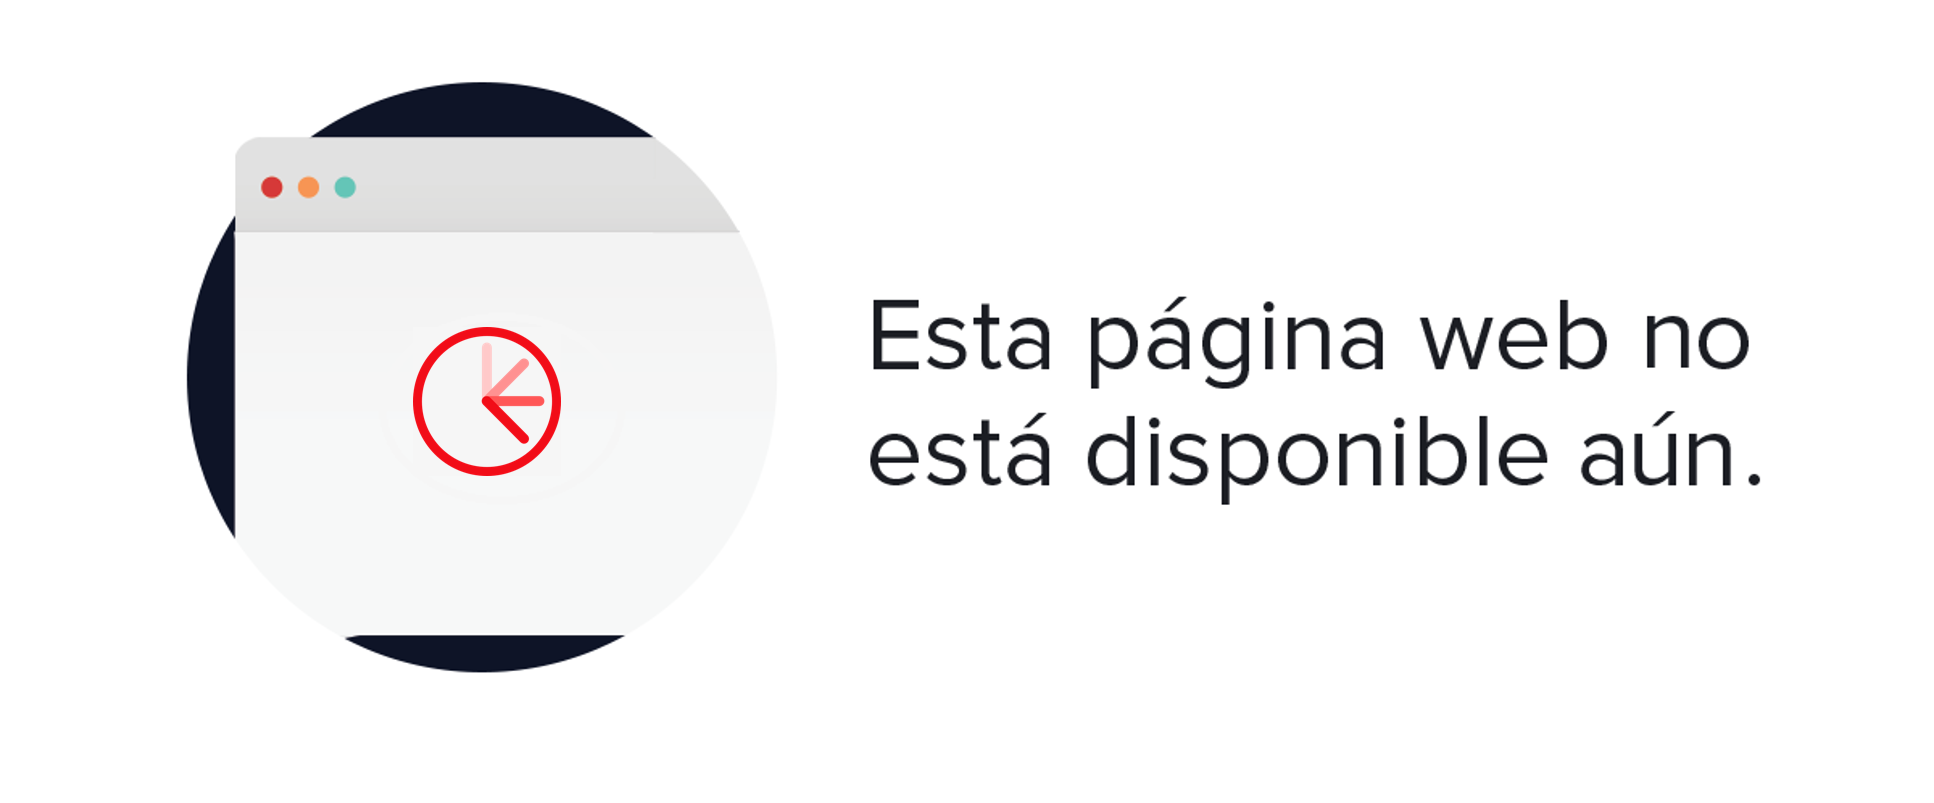 Americana mujer manga 3/4 rayas en punto neopreno rayas 1LV024700